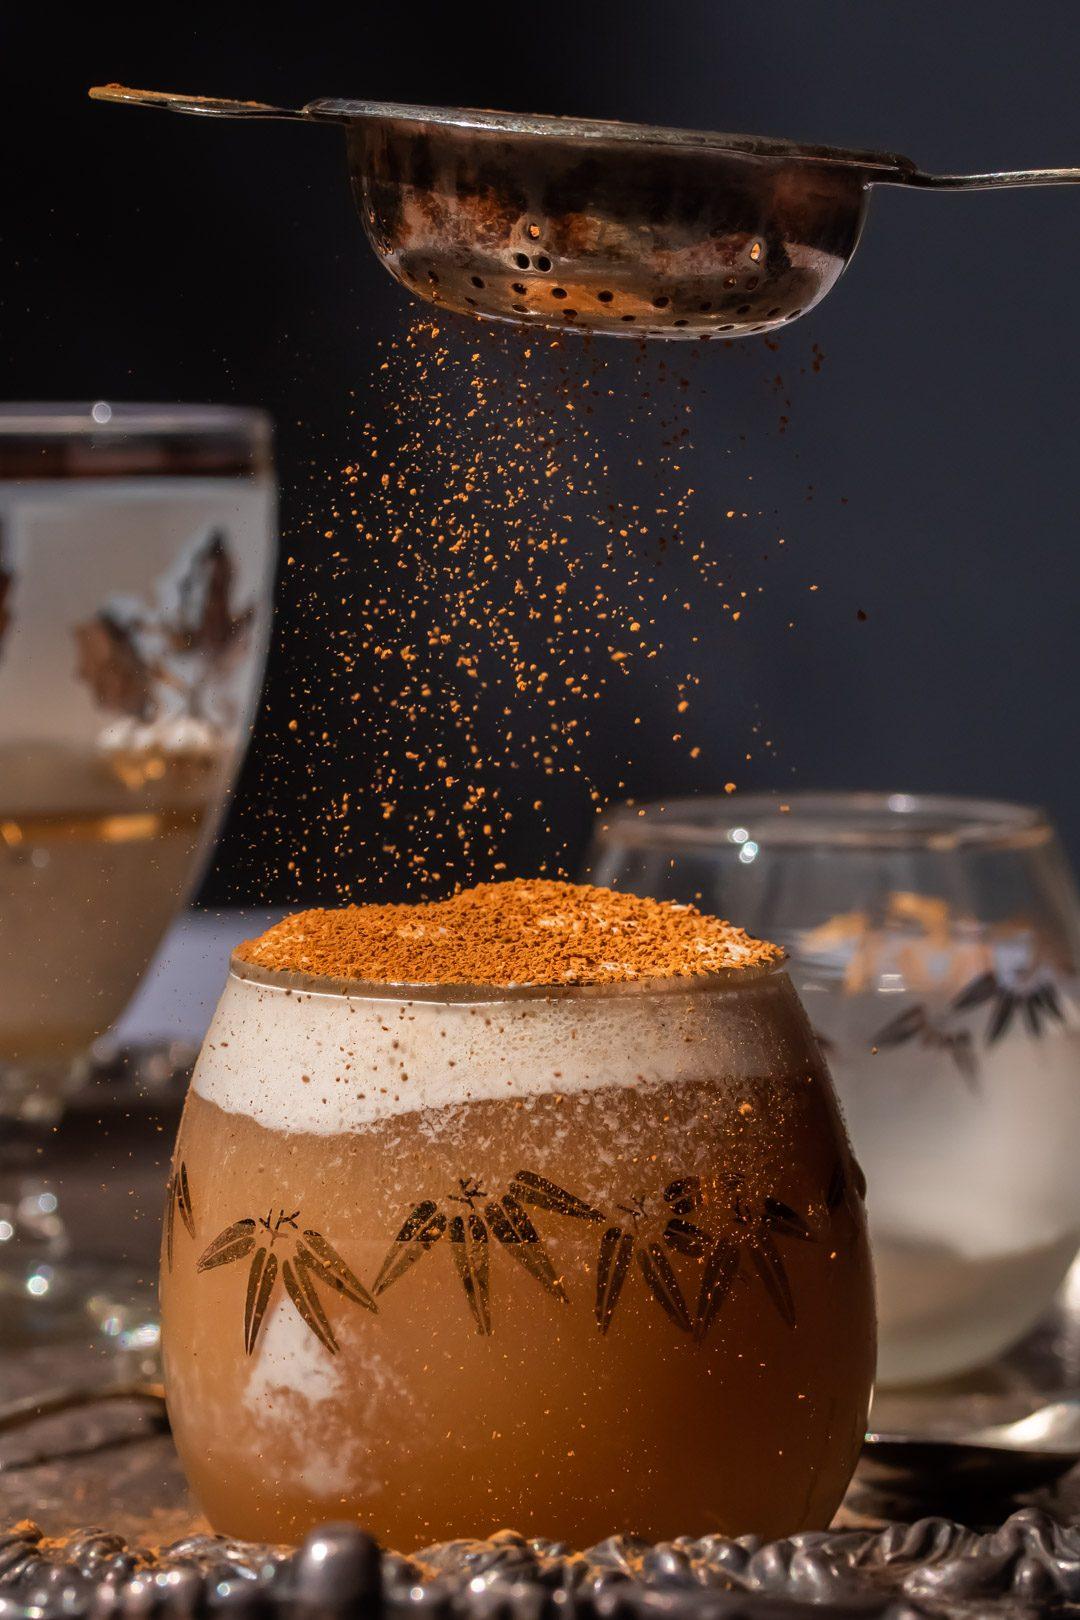 sprinkling cinnamon on lemon myrtle ginger beer spiders with vintage tea strainer